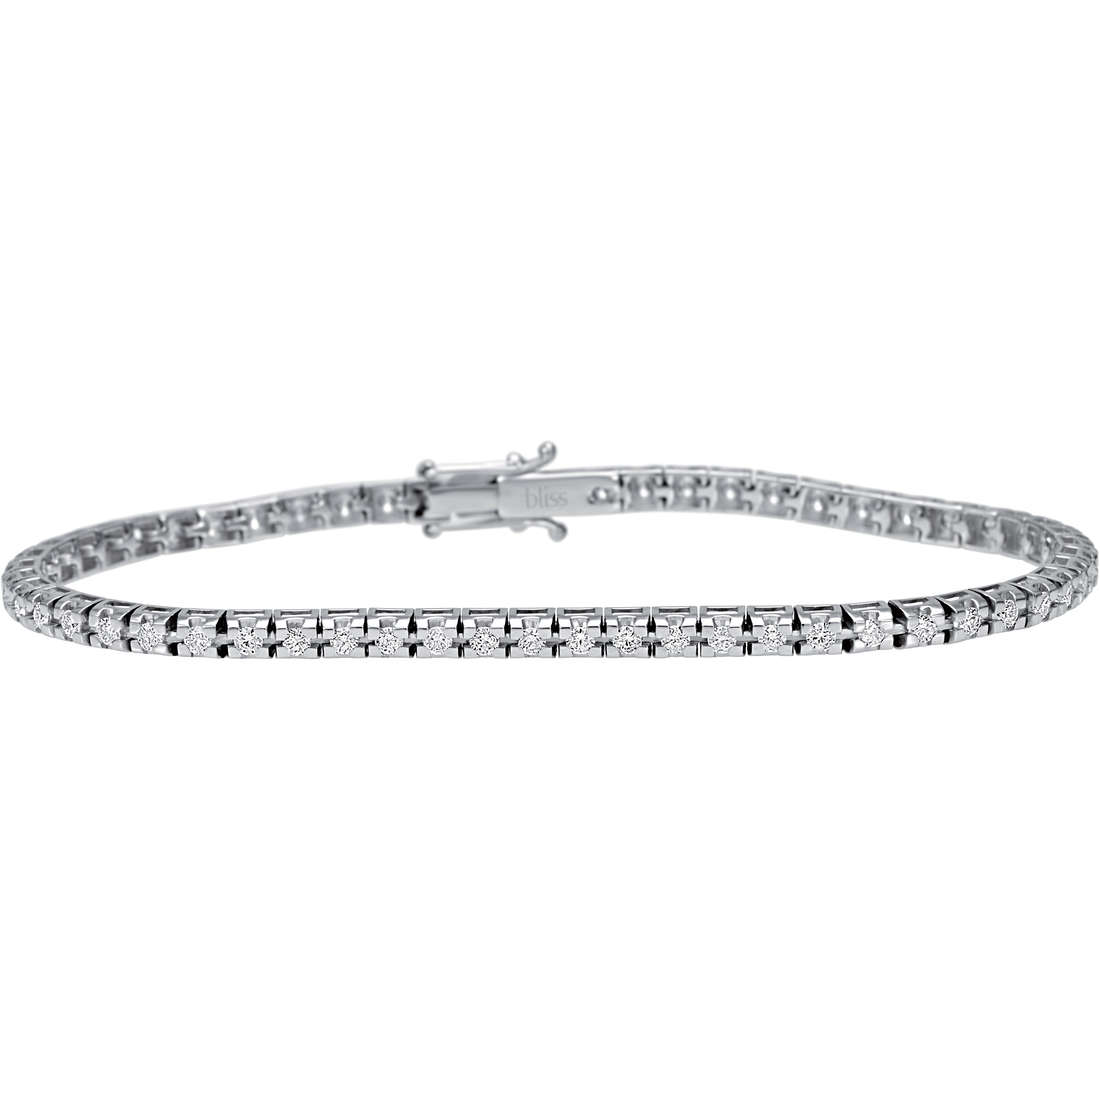 bracelet woman jewellery Bliss First class 20061011